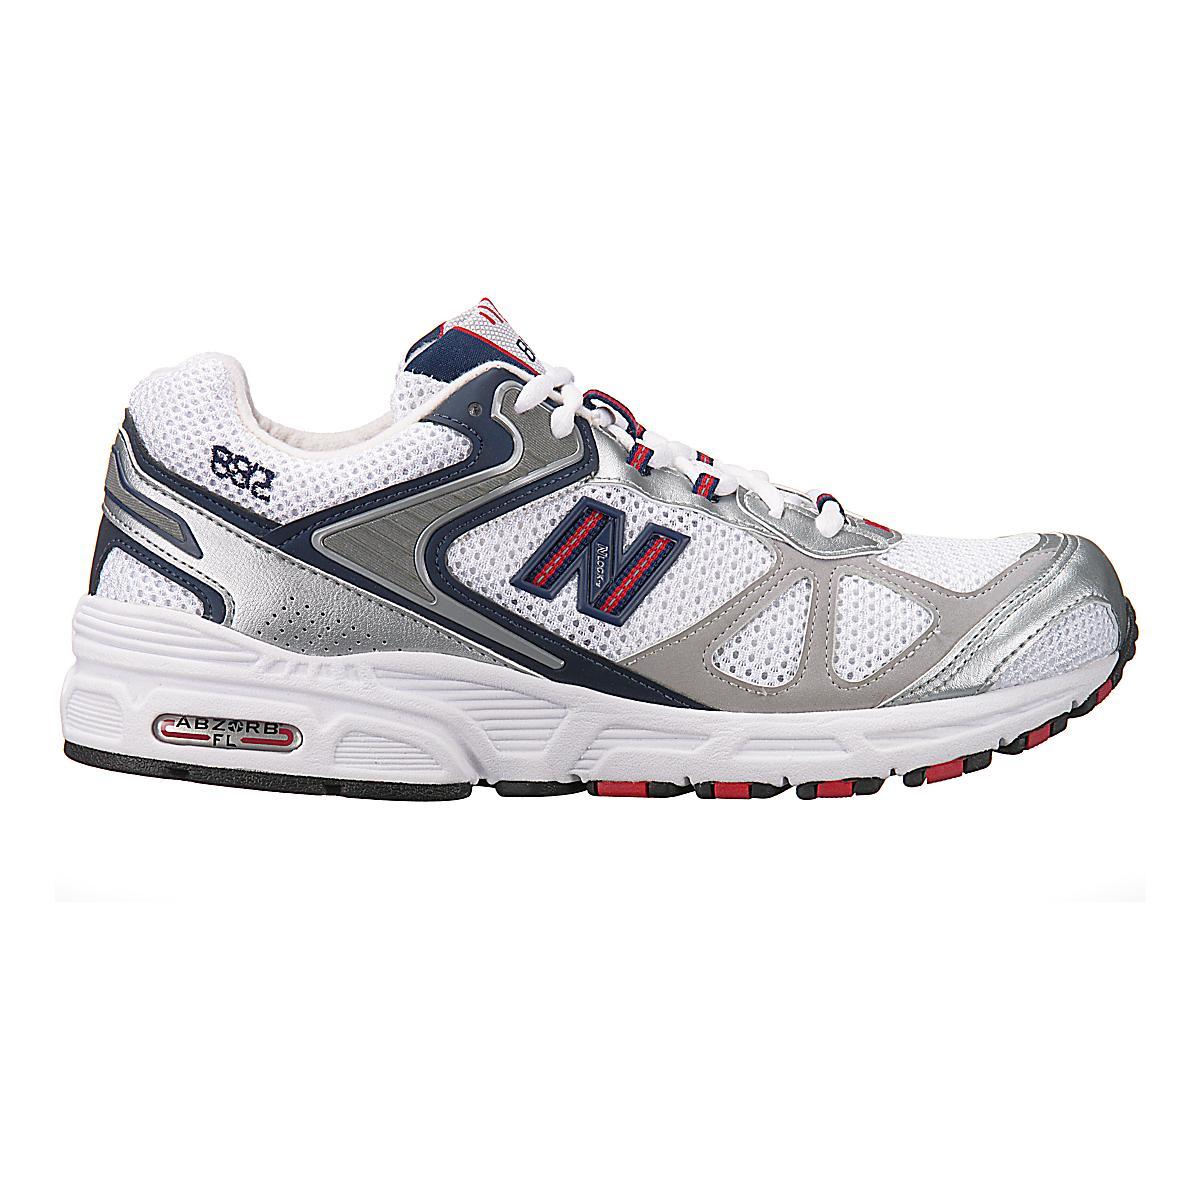 sofá interno enlace  Mens New Balance 882 Running Shoe at Road Runner Sports